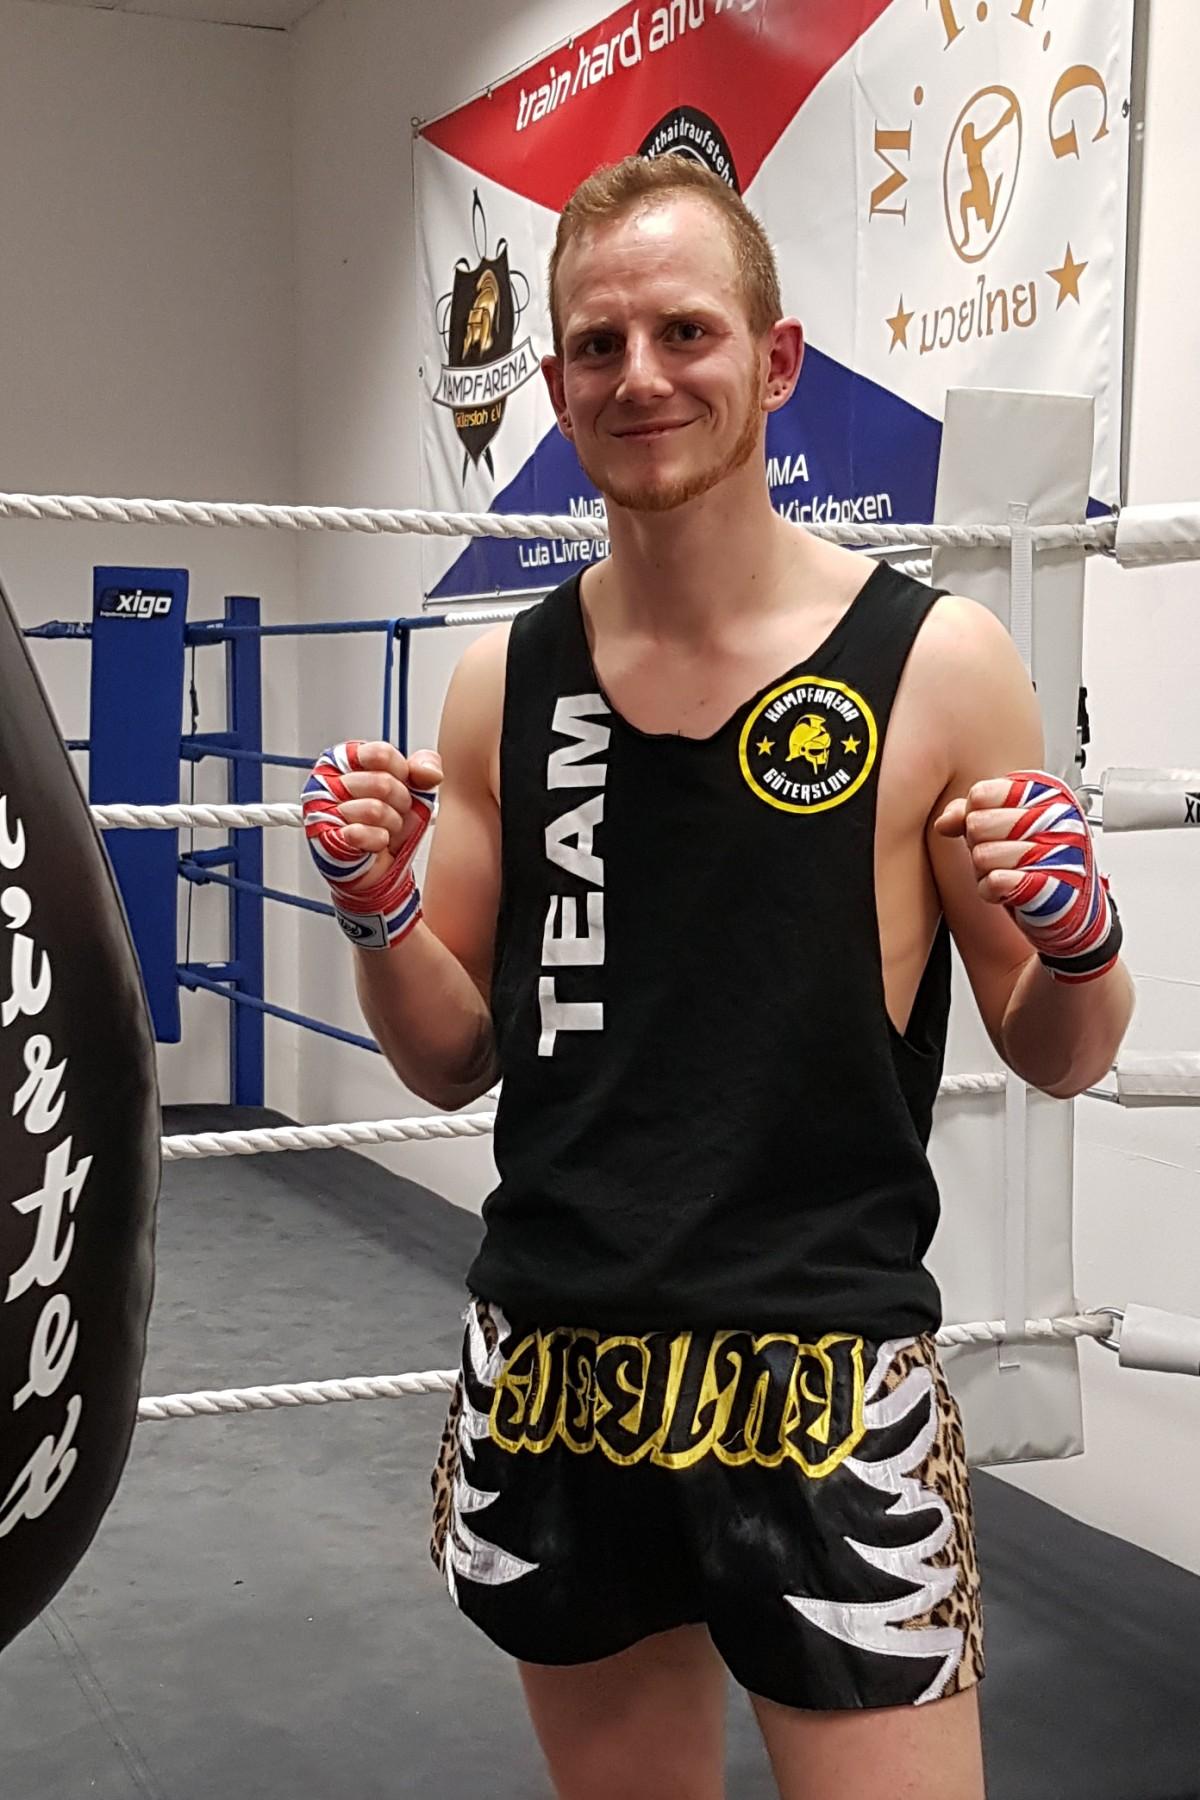 Alex Henkenjohann, Muaythai, K-1, Gütersloh, Kampfarena, Kampfsport